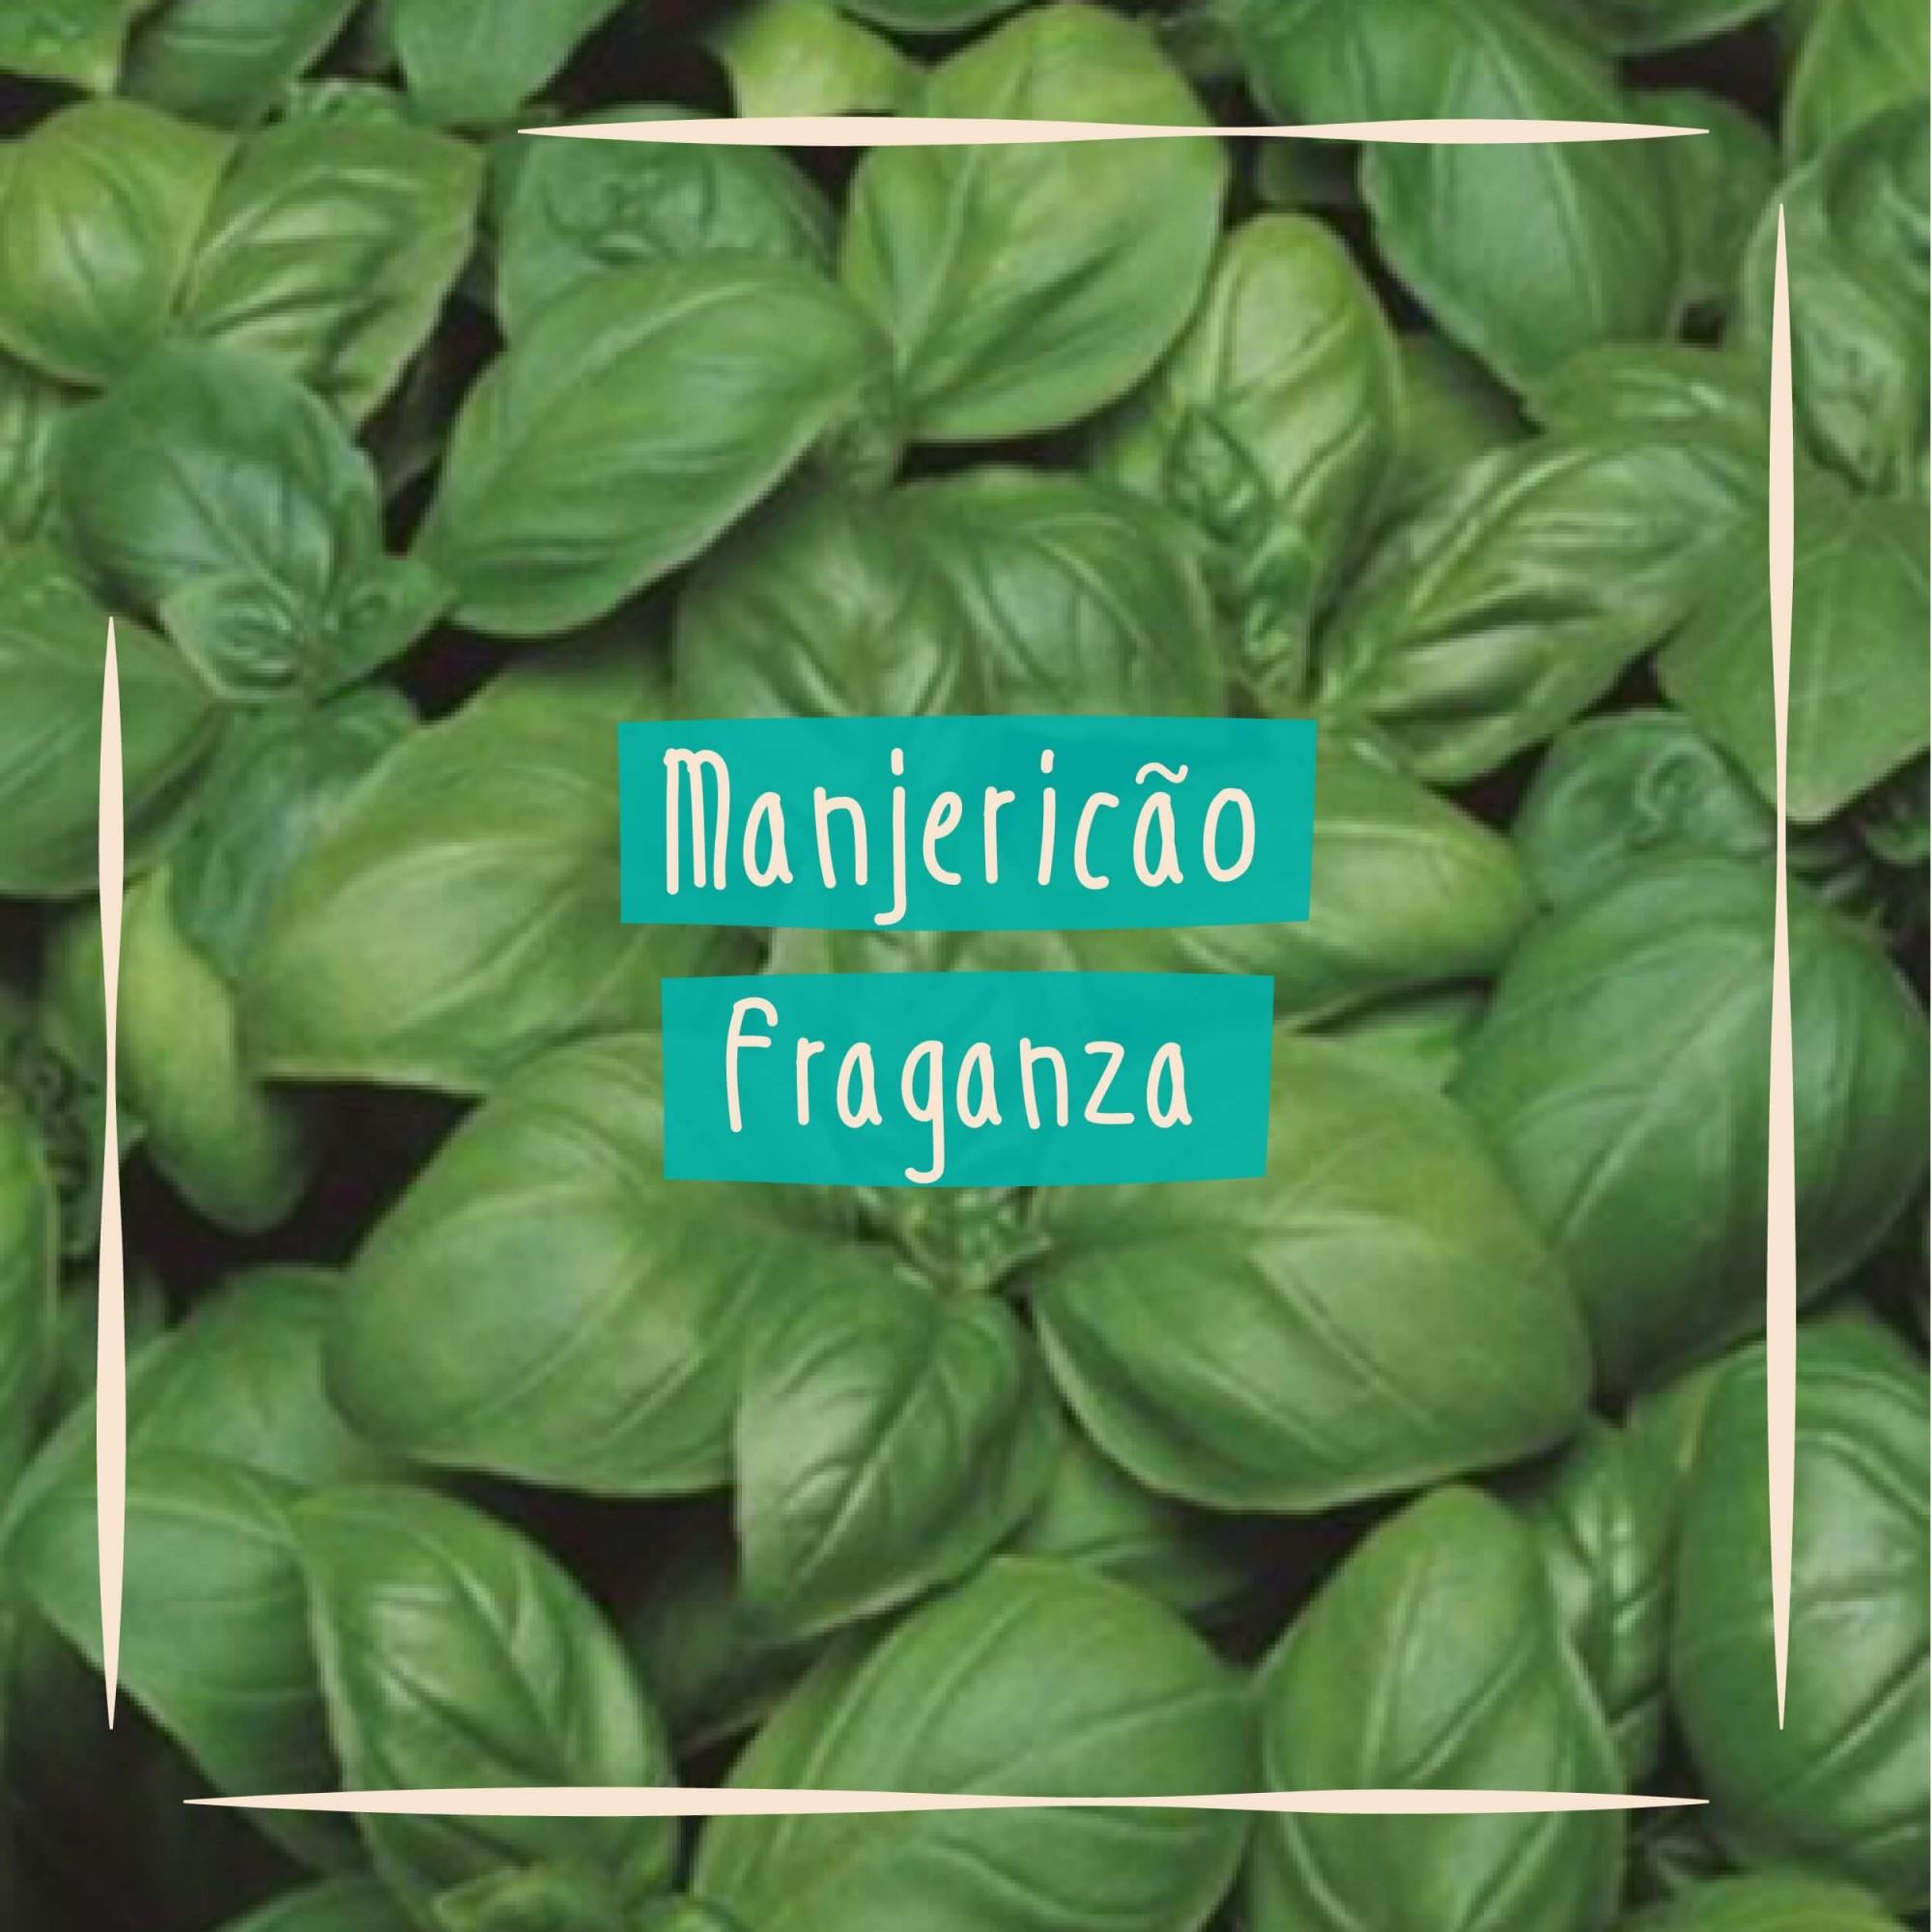 Sementes para plantar Manjericão Basílico Folha Larga em vasos autoirrigáveis RAIZ  - Loja Raiz